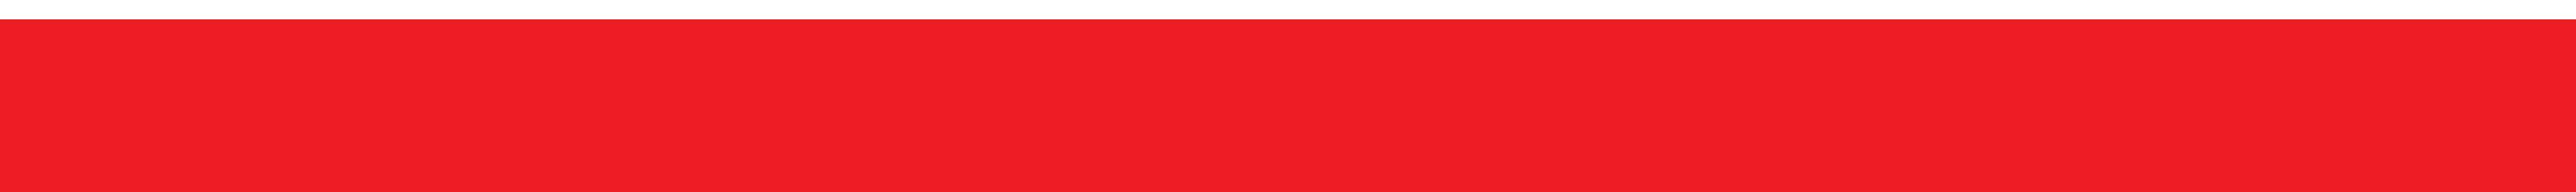 ARAS red banner bg (top)